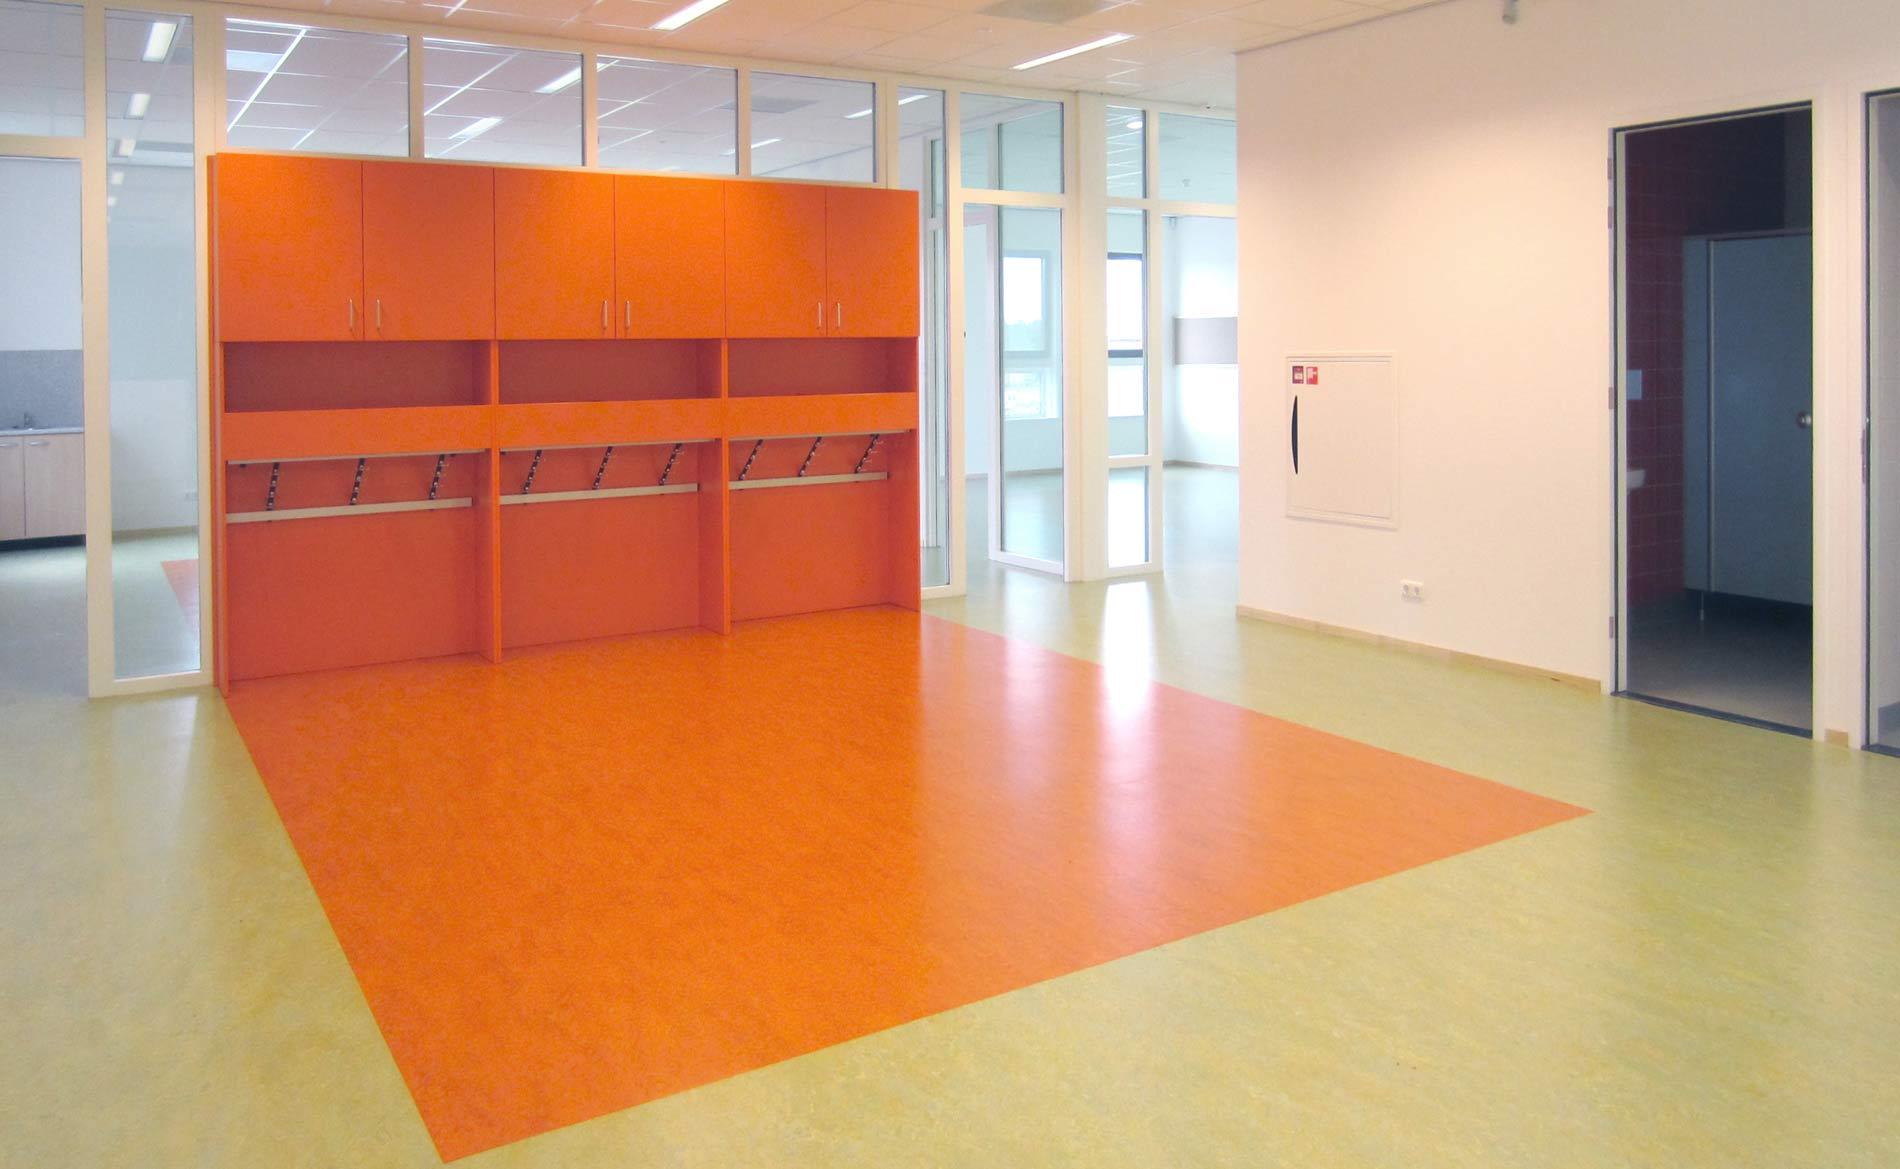 architect school basisschool Panta Rhei Zeewolde BBHD architecten